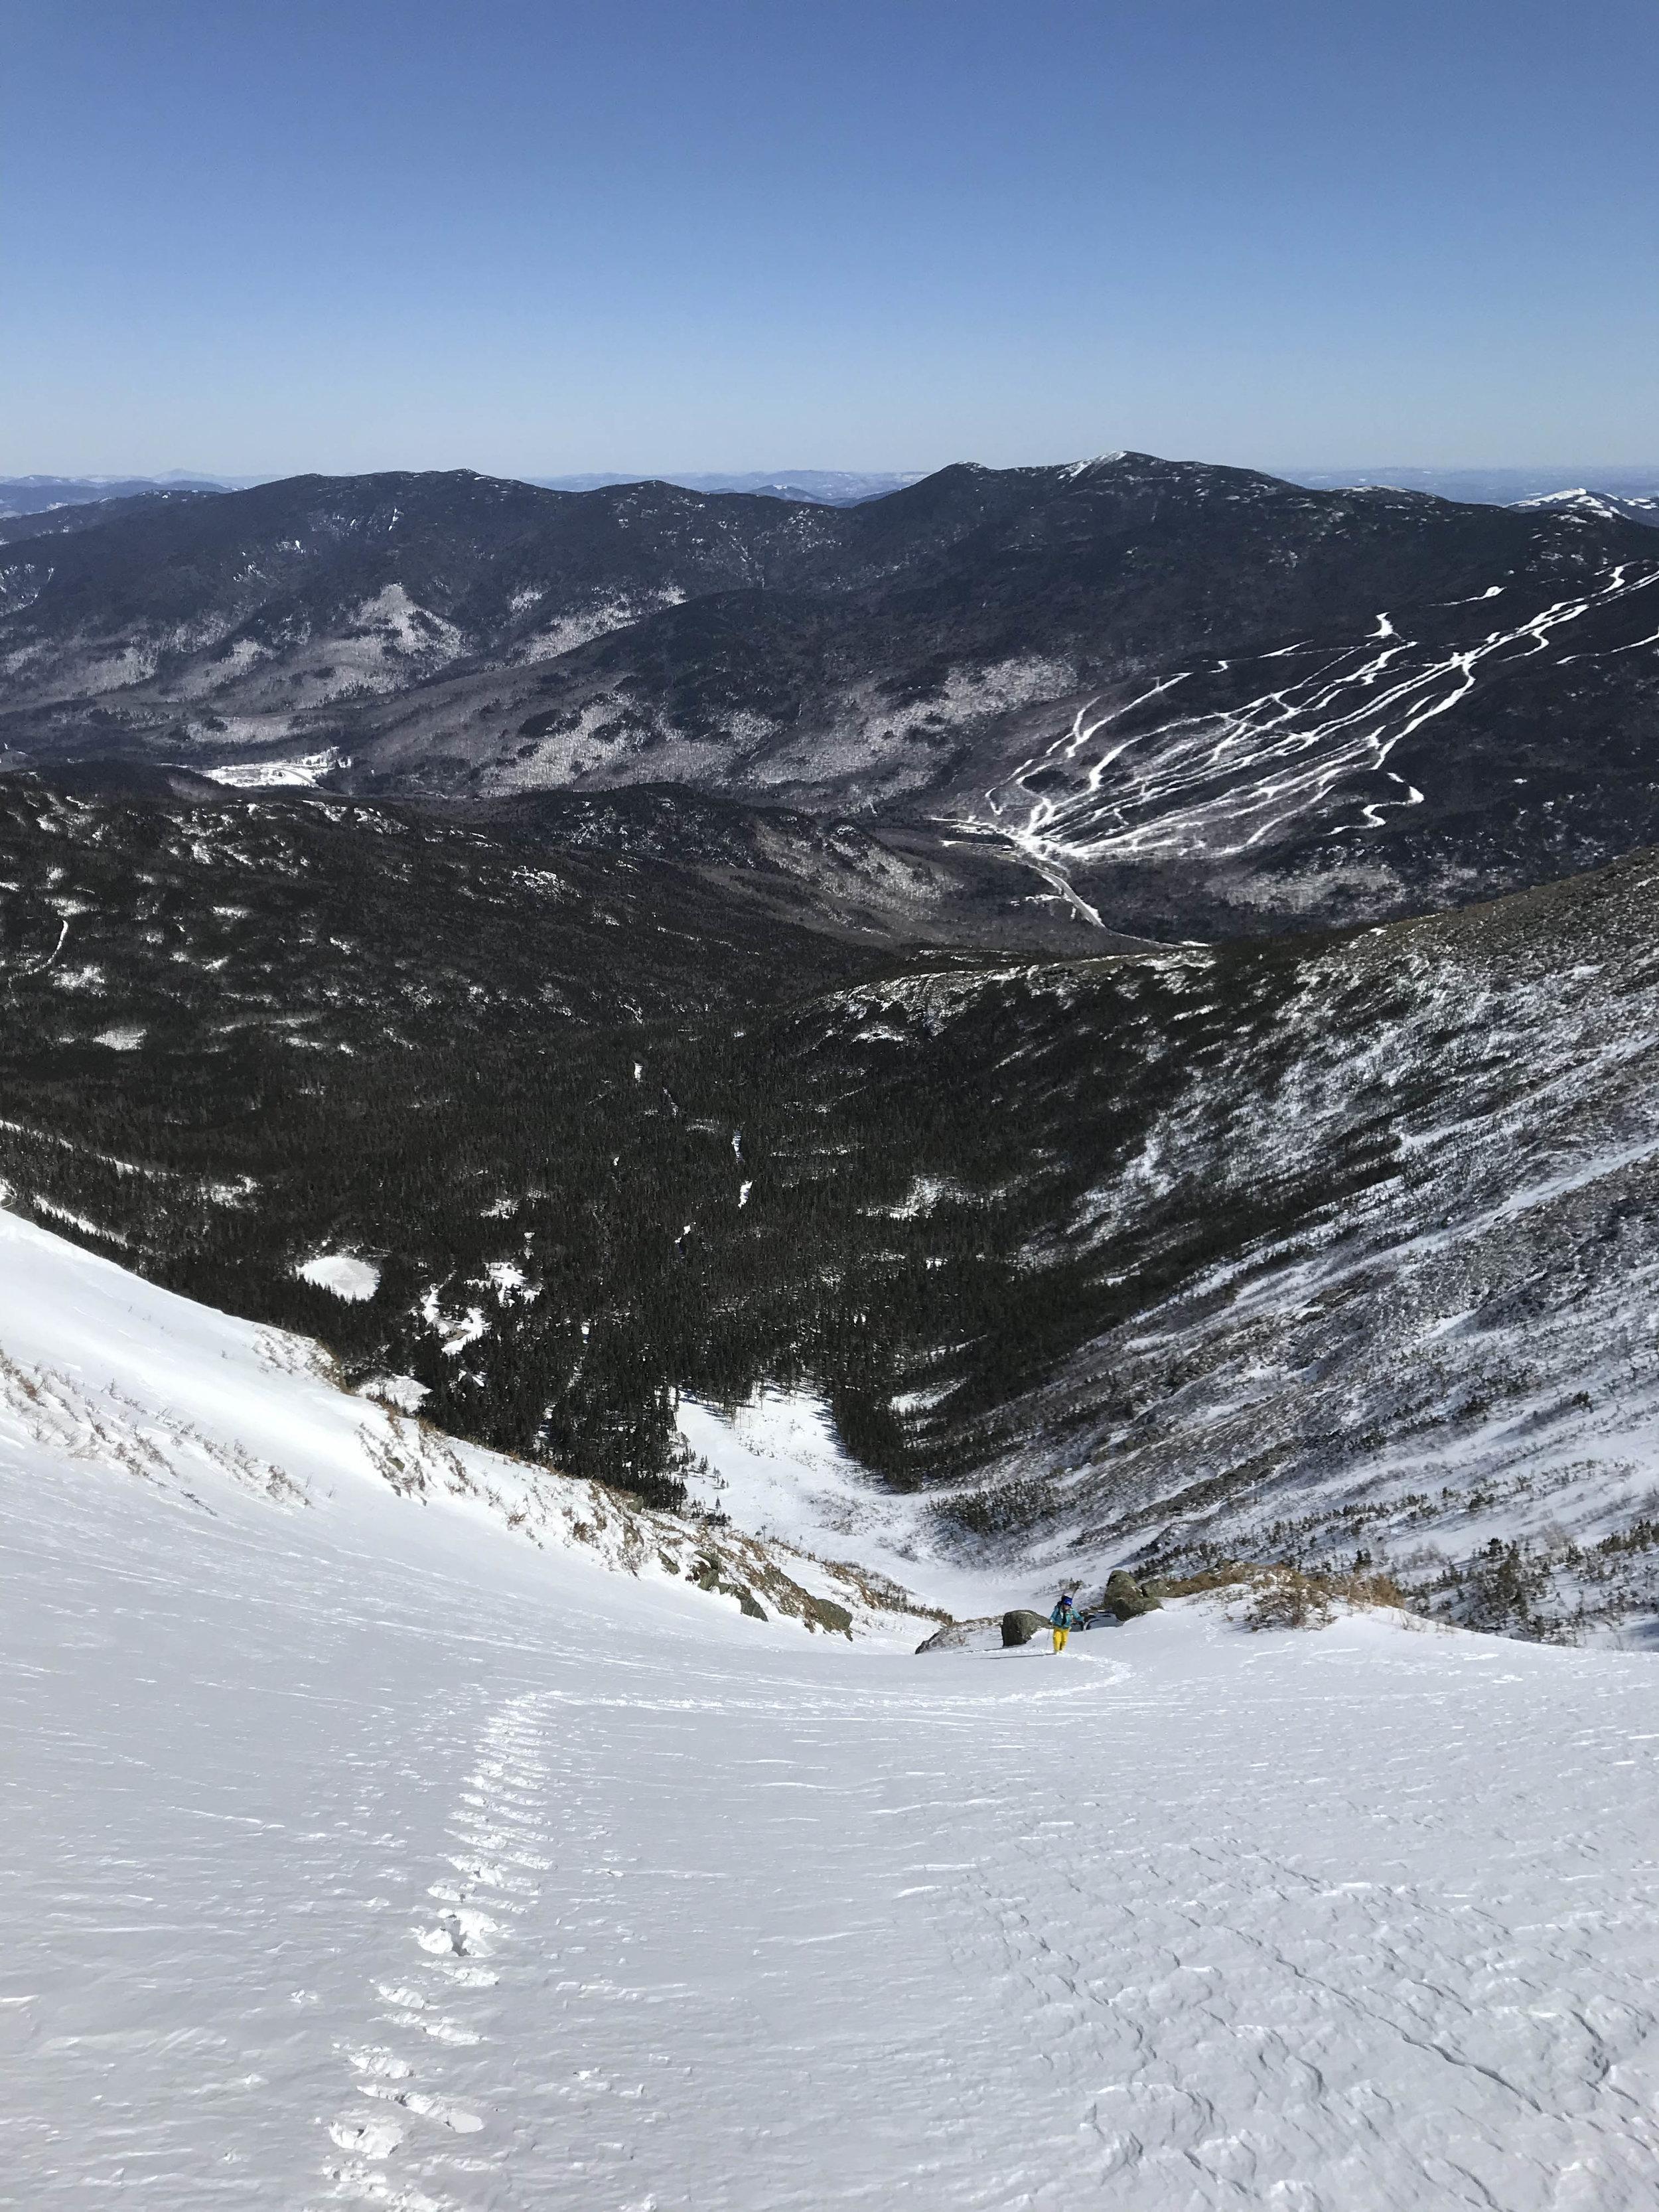 Skiing Hillman's Highway